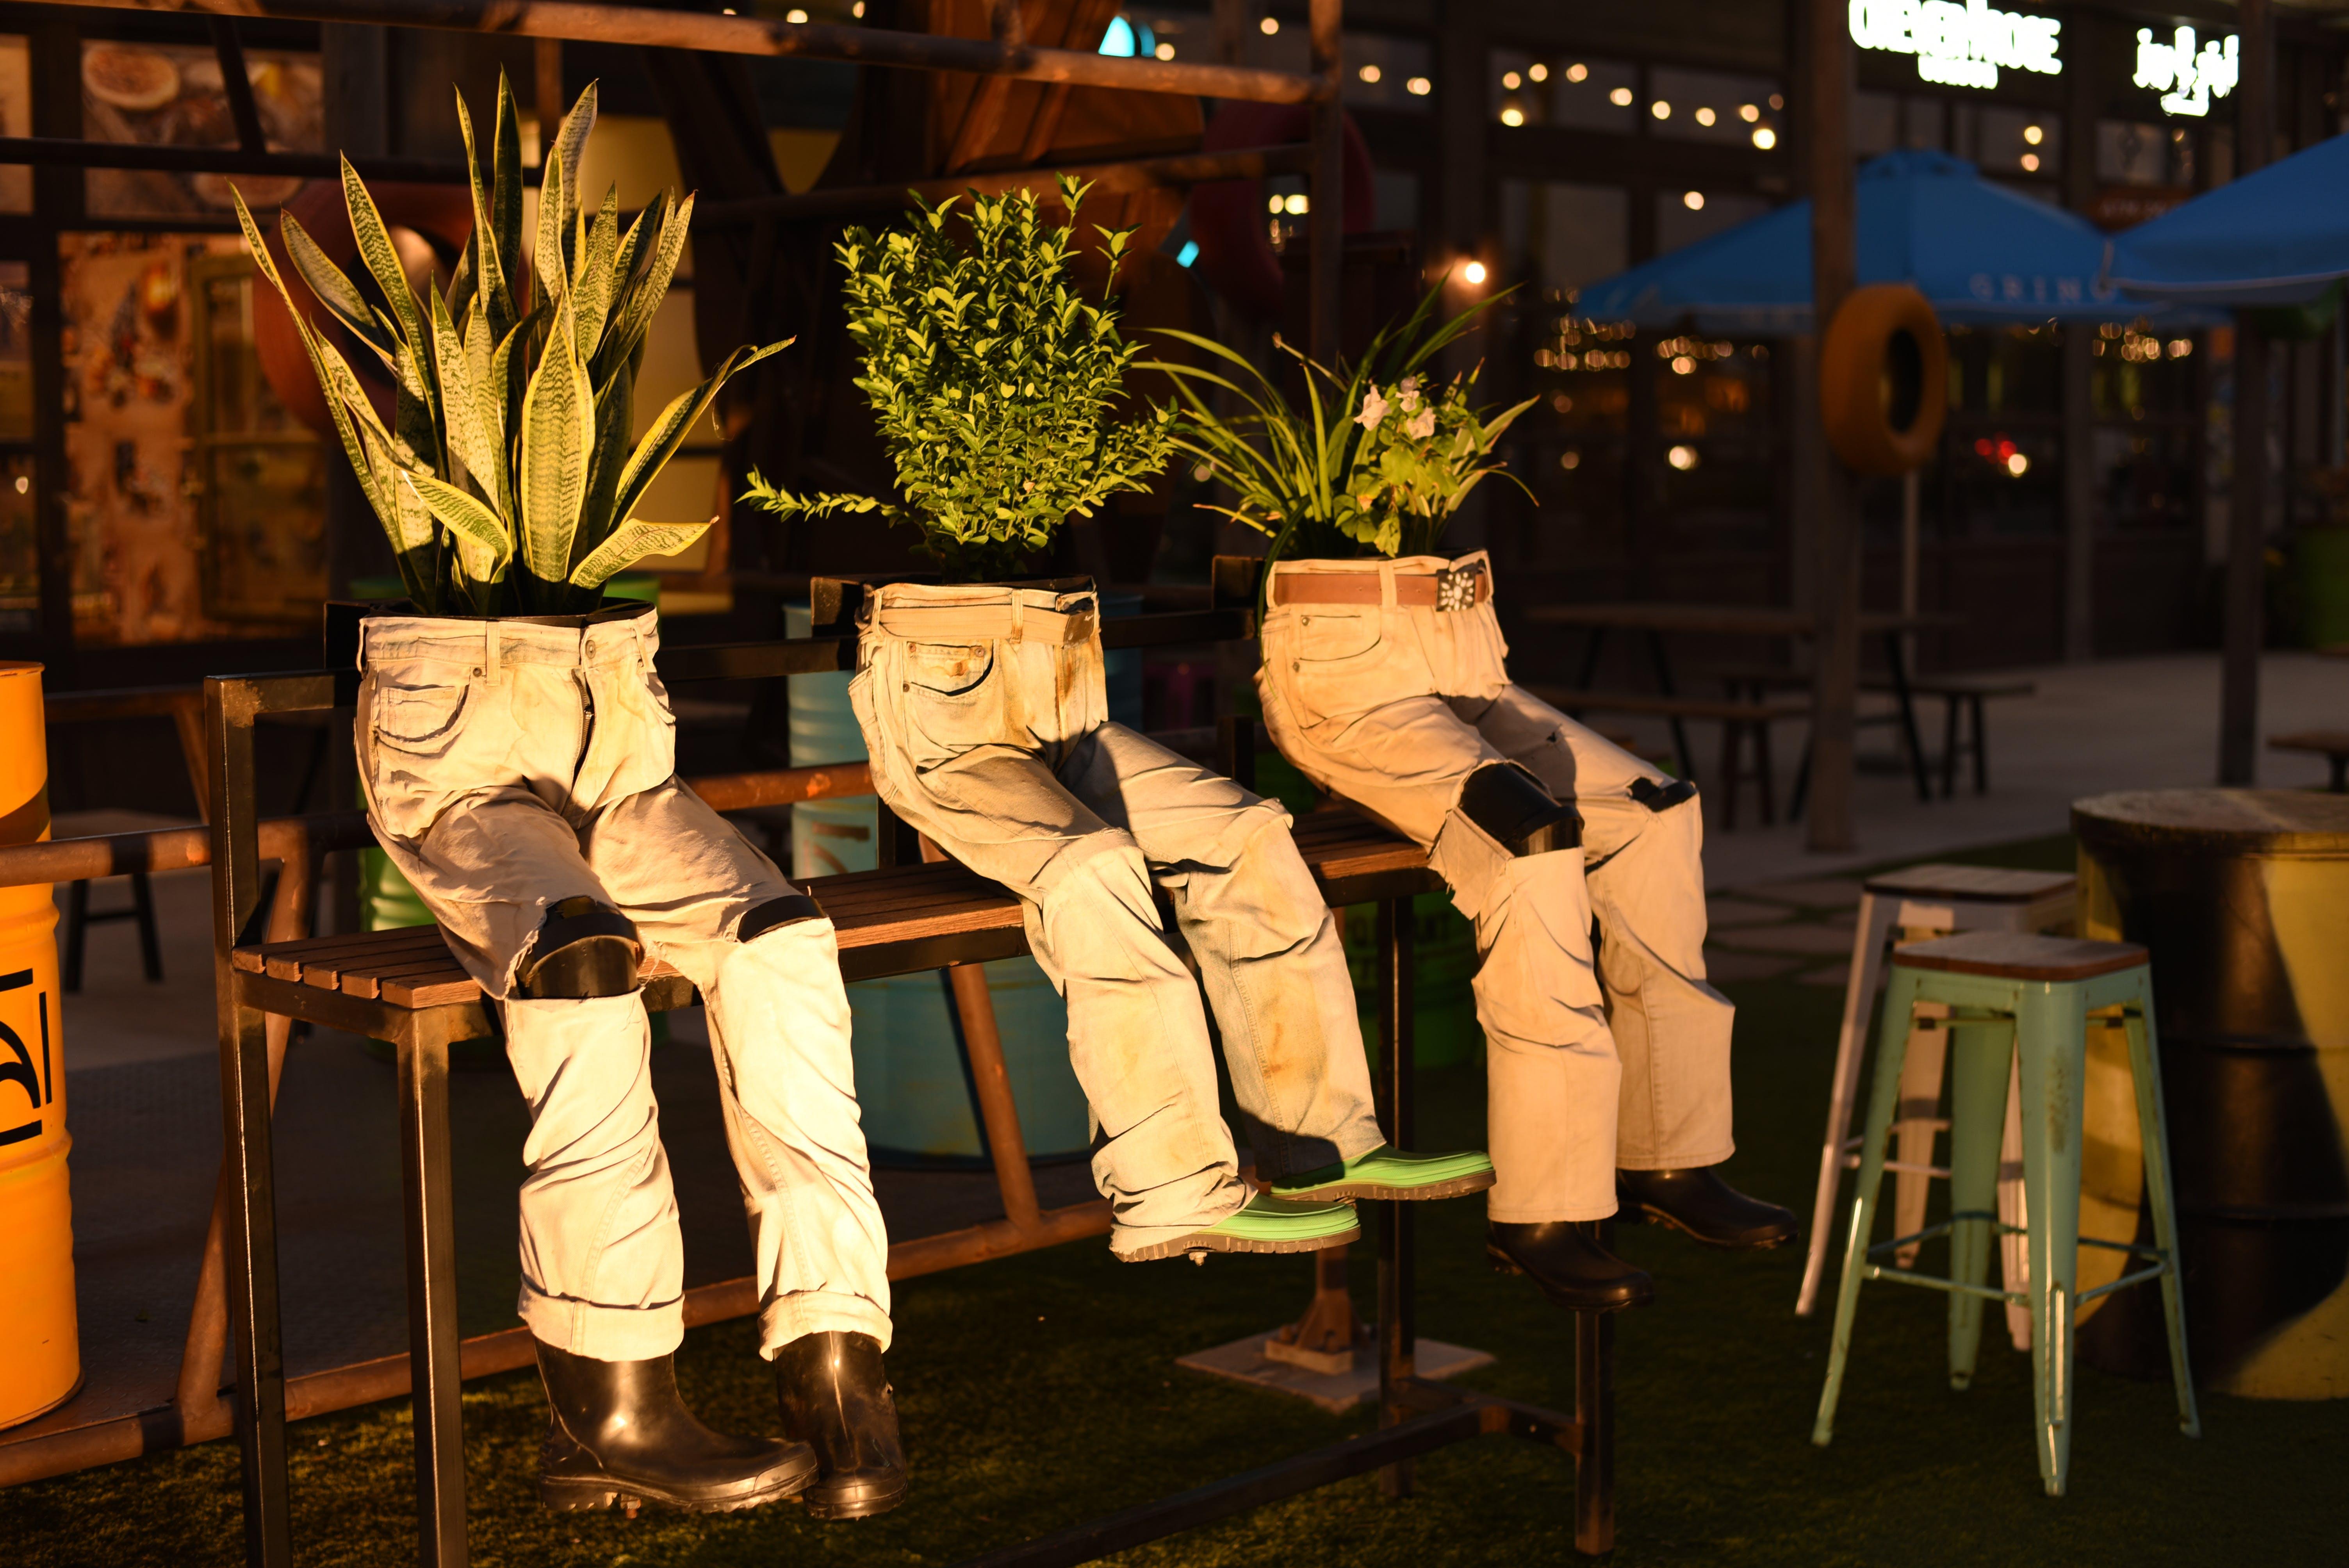 Základová fotografie zdarma na téma Dubaj, lastexit, meraas, noc